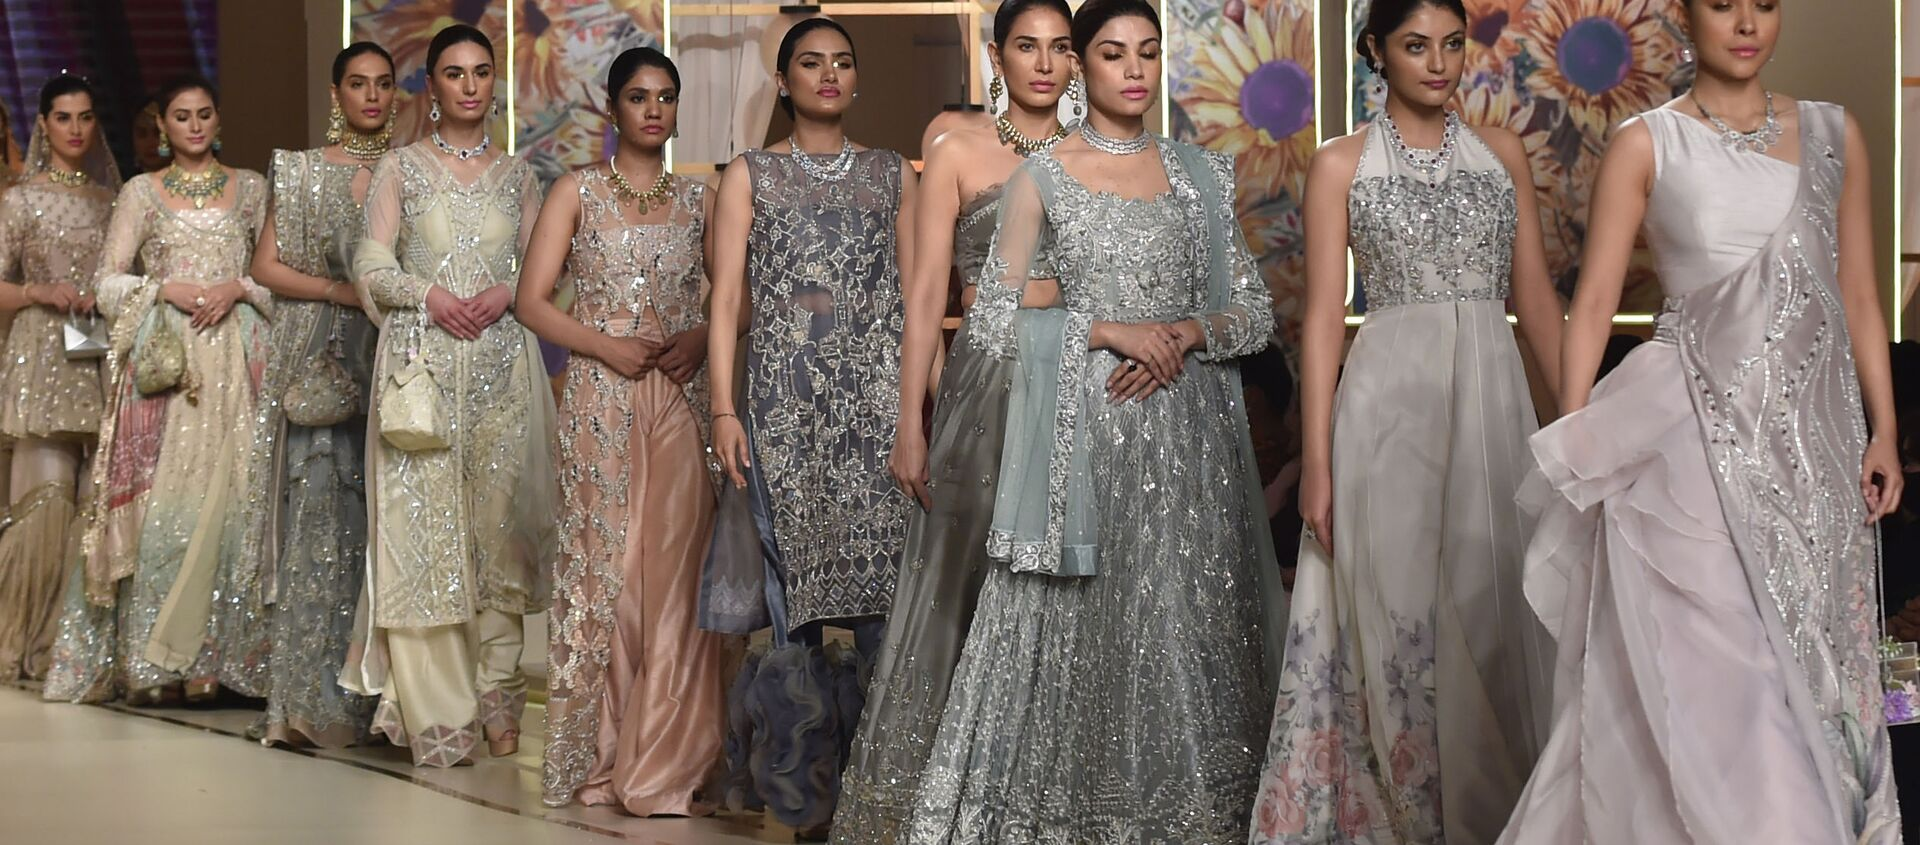 Модели во время презентации коллекции Ayesha and Usman Ali на показе мод Hum Bridal Couture Week в Лахоре  - Sputnik Азербайджан, 1920, 08.02.2021